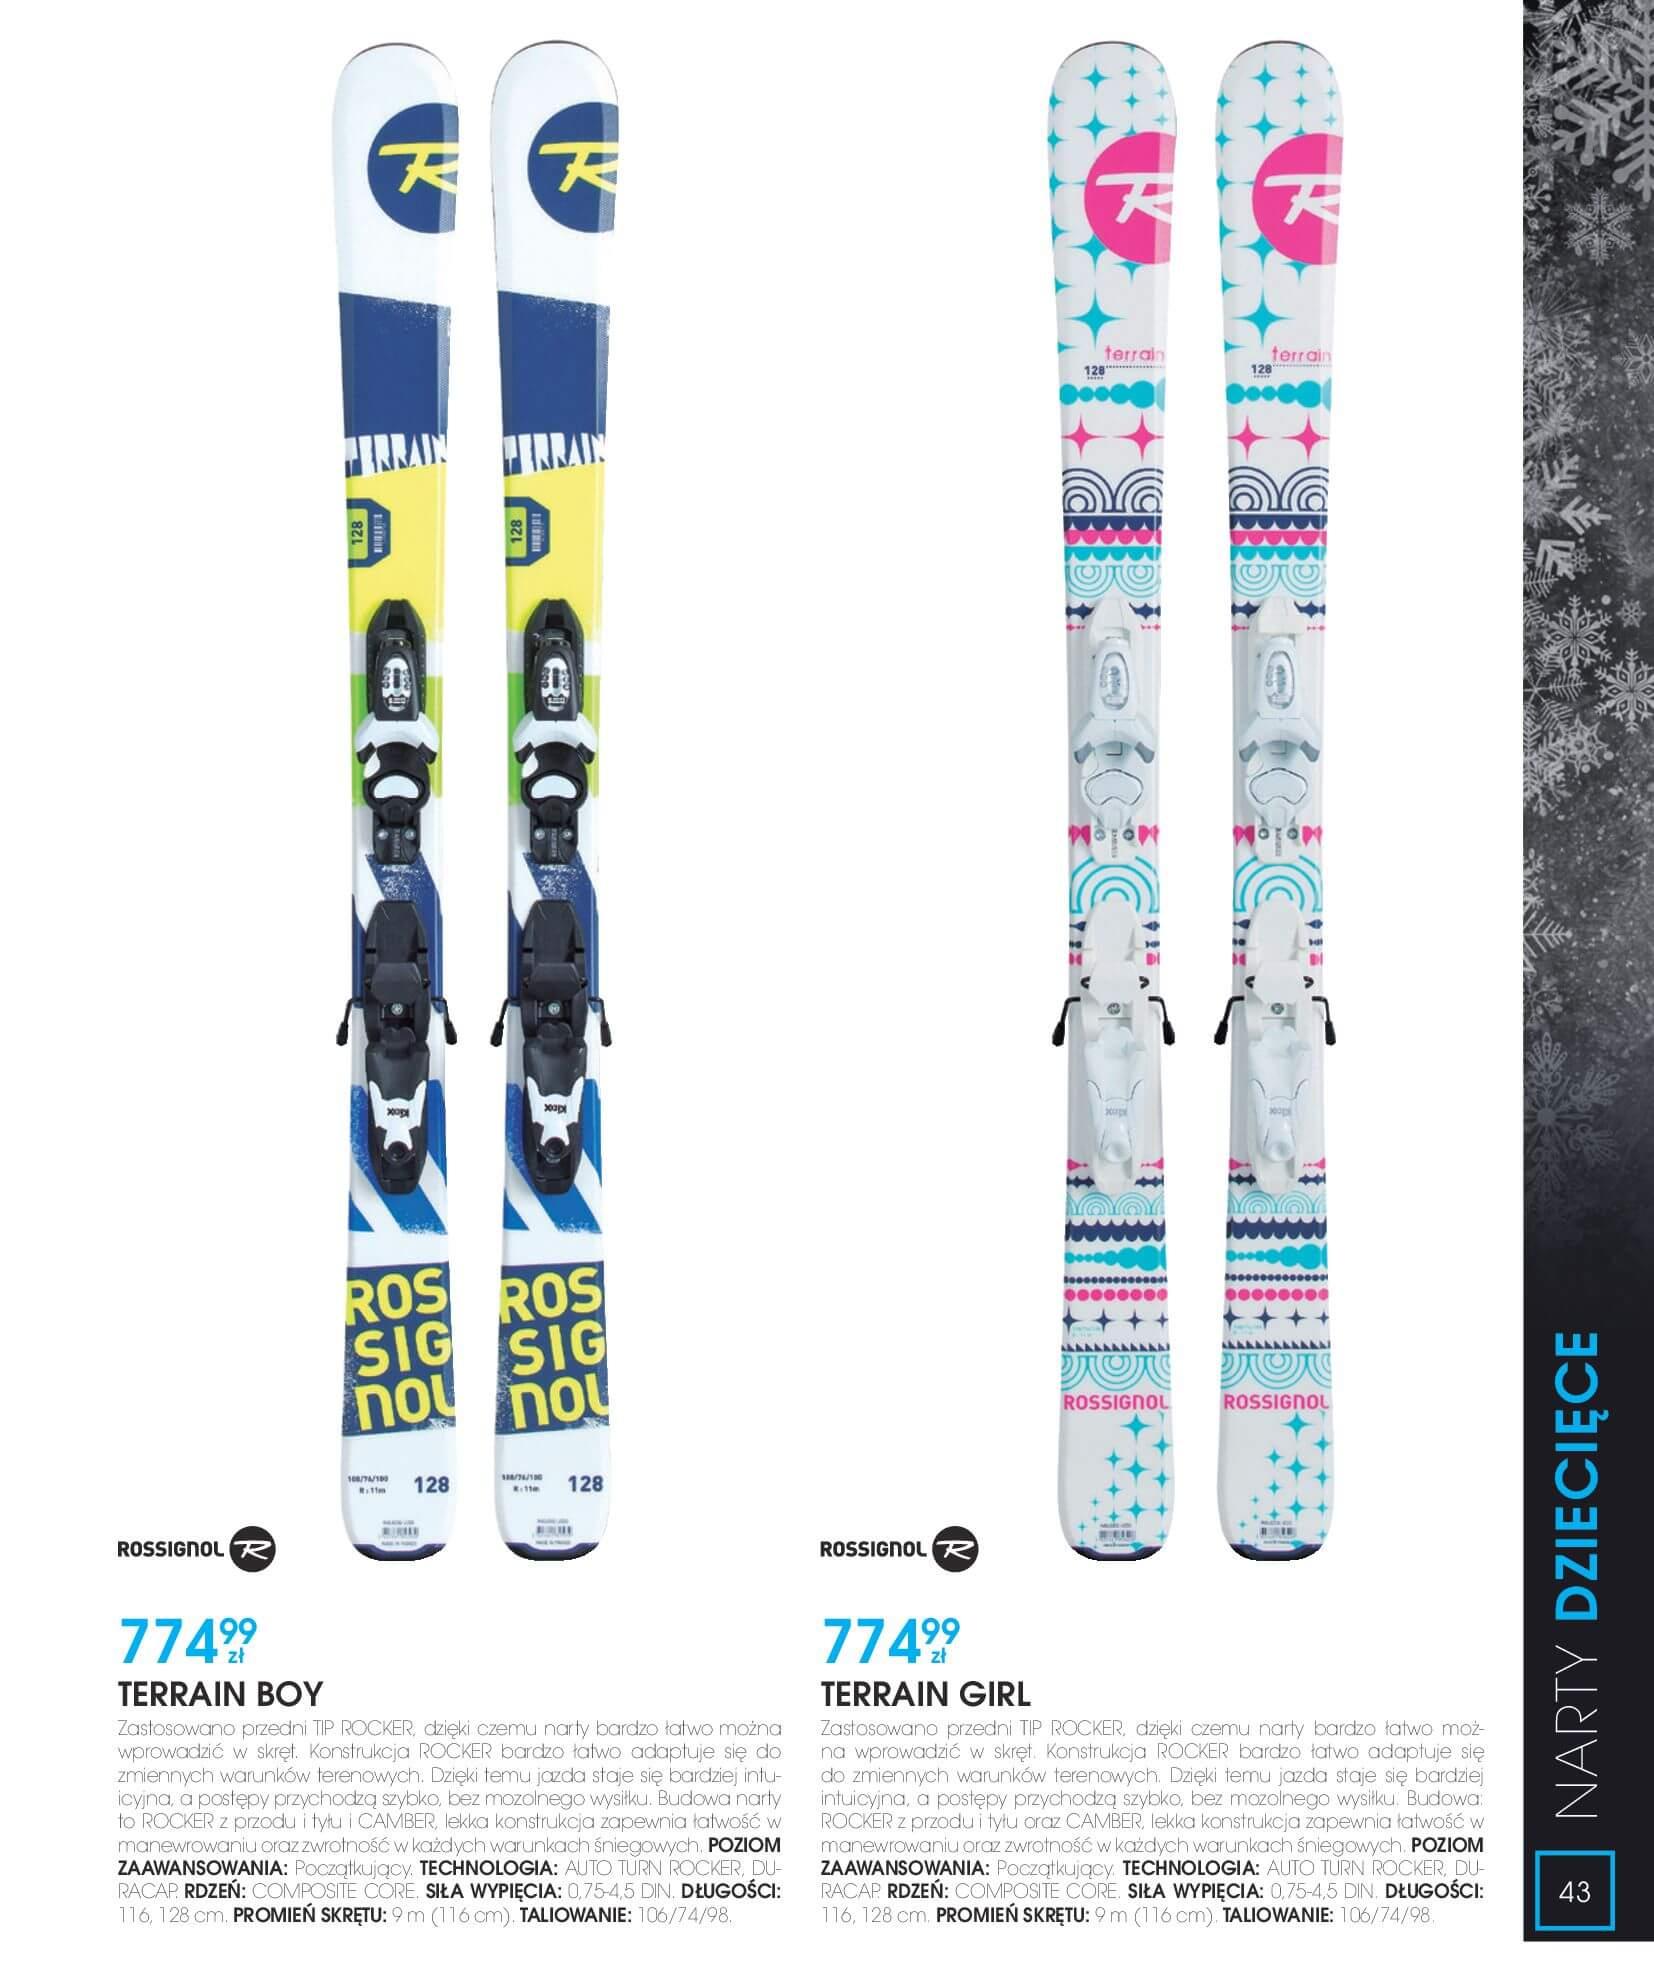 Gazetka Go Sport - Katalog Zima 2017/2018-12.11.2017-28.02.2018-page-43